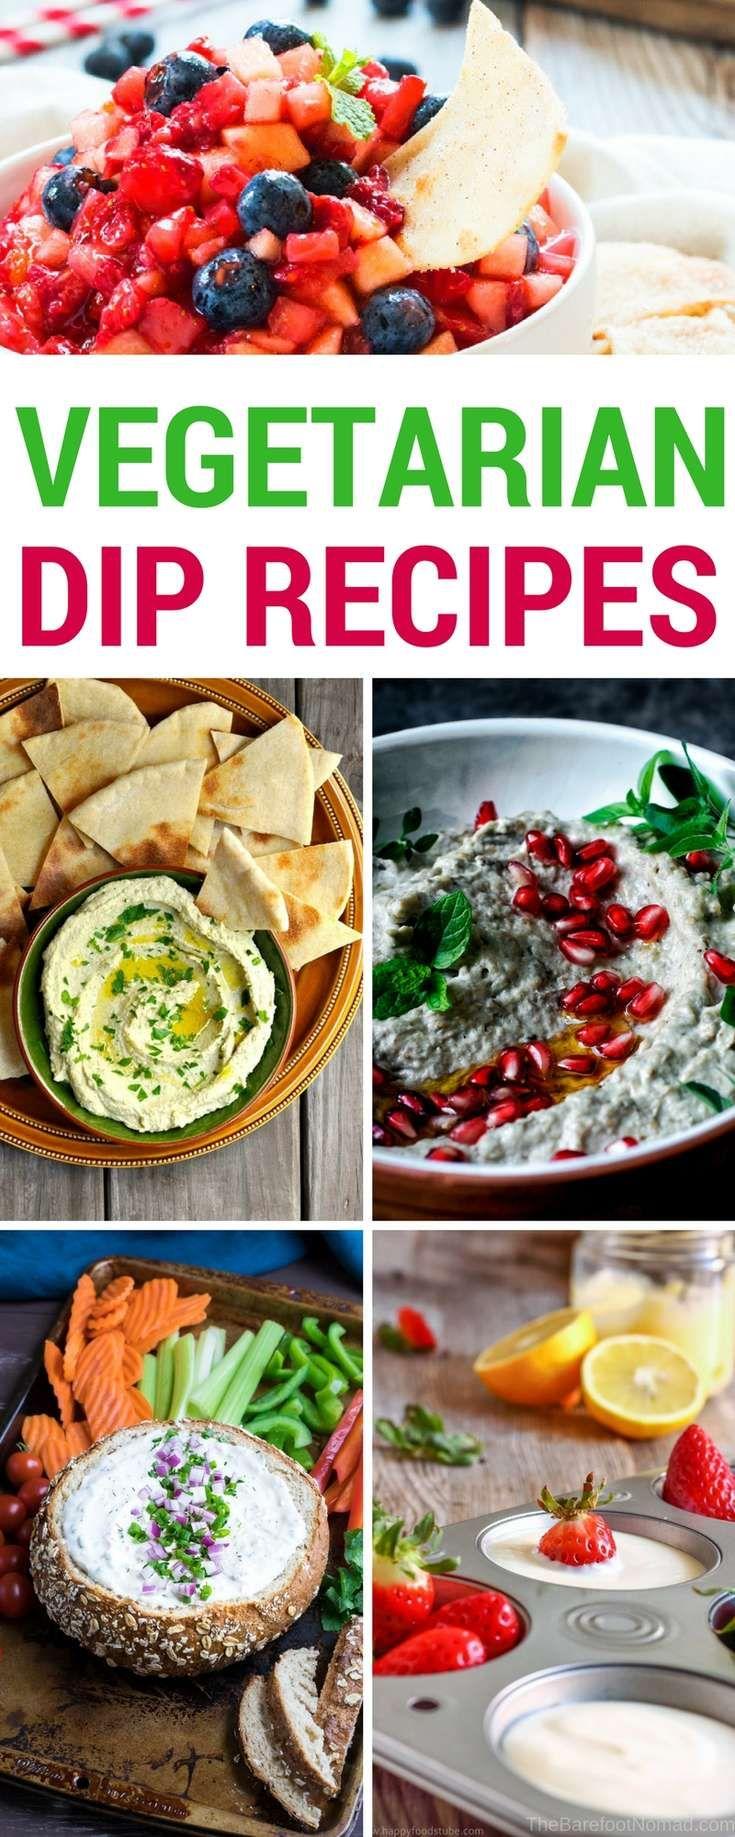 Vegetarian Dip Recipes Result The Parent Spot Vegetarian Dip Vegetarian Dip Recipe Recipes